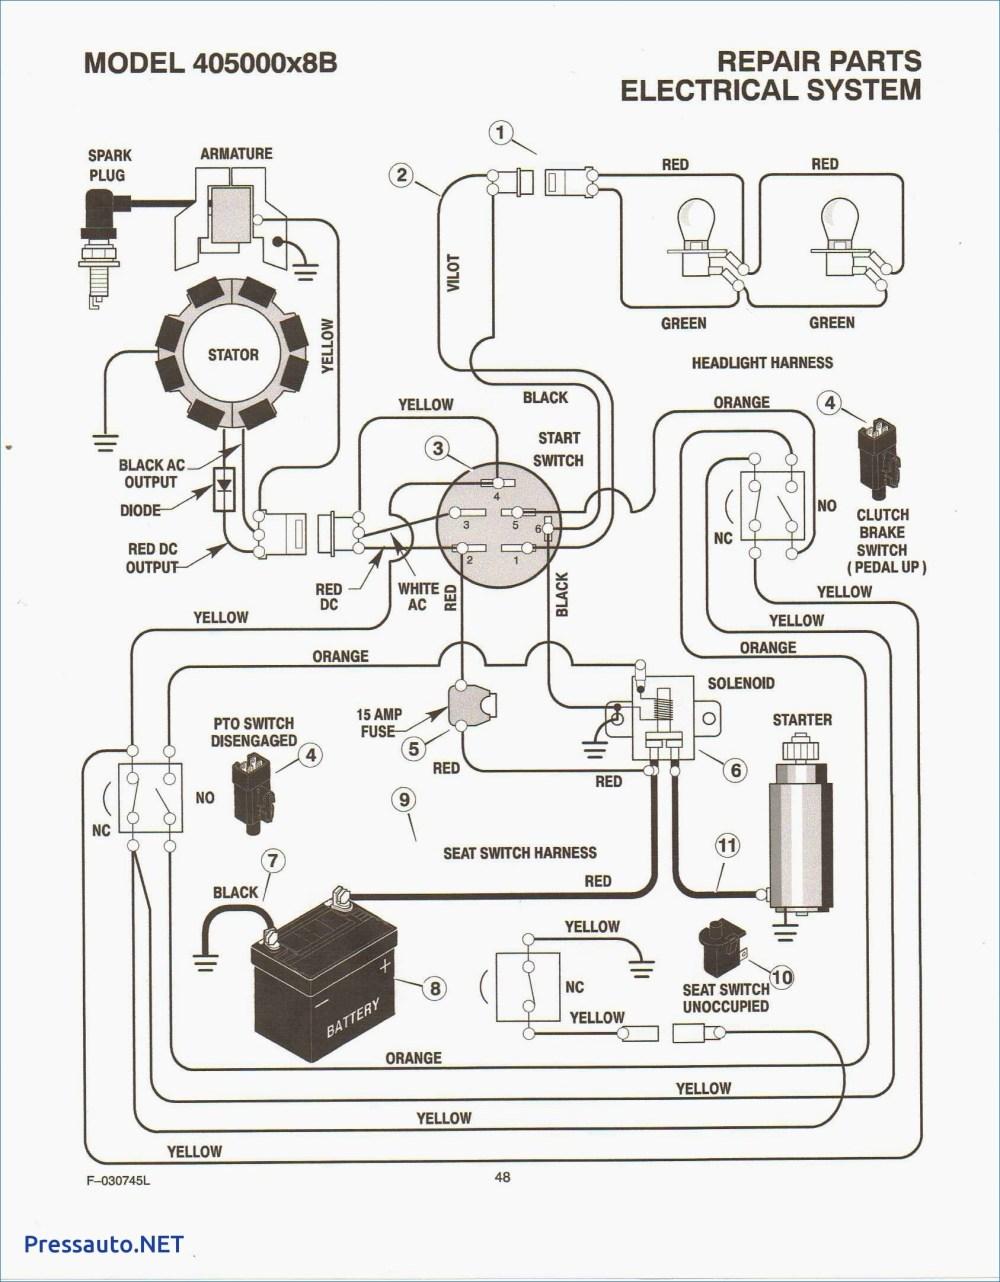 medium resolution of jd 111 wiring diagram blog wiring diagram john deere model 111 wiring diagram jd 111 wiring diagram